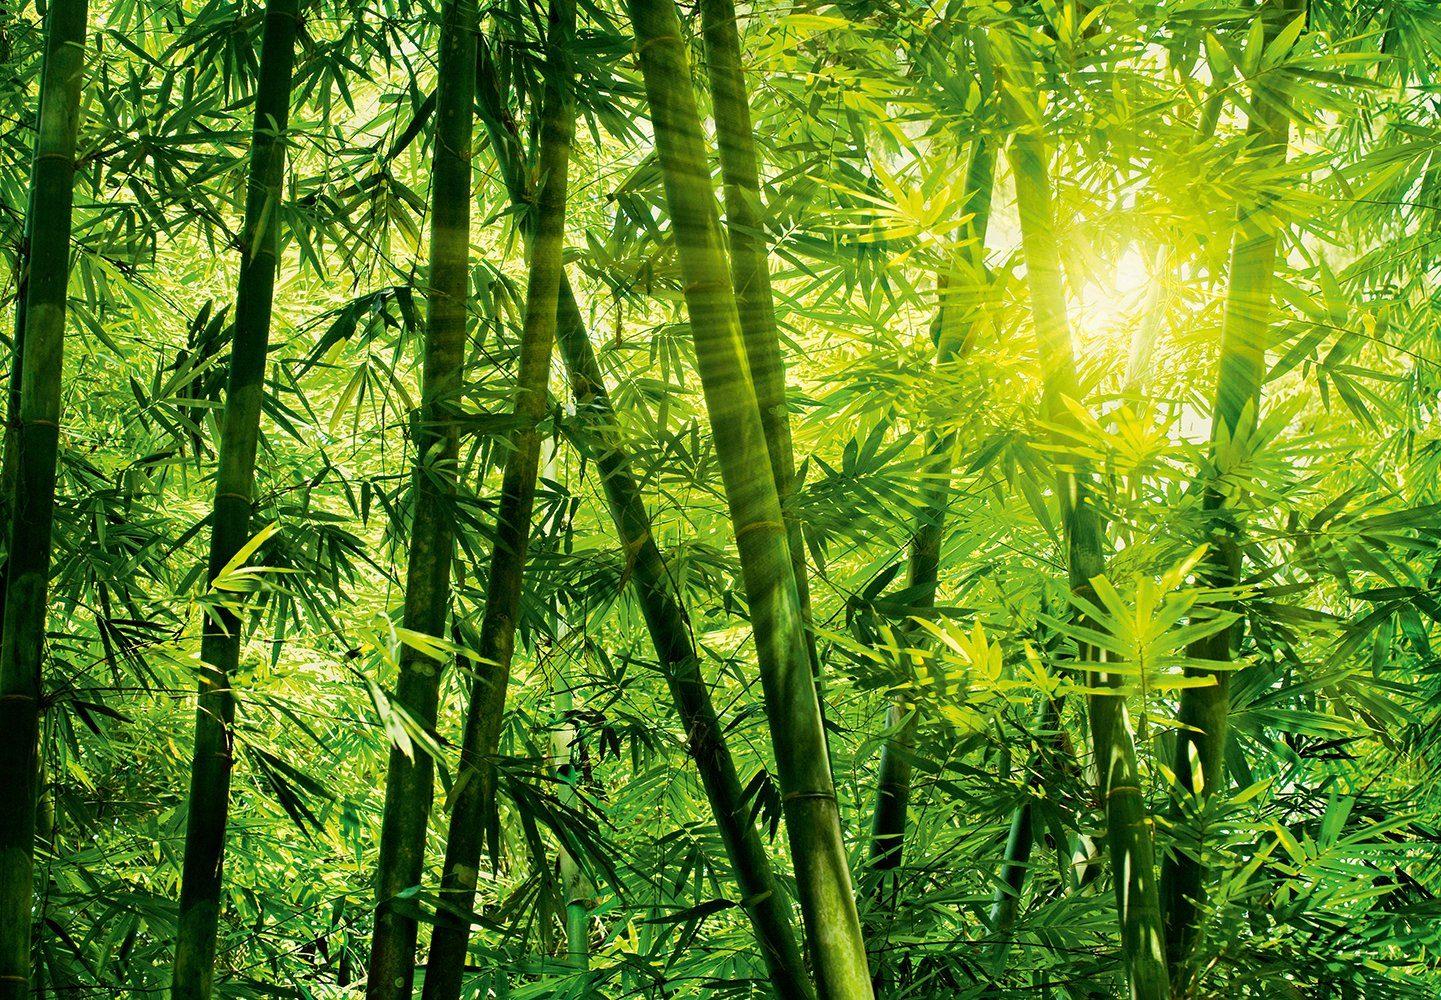 Fototapete »Bamboo Forest«, 8-teilig, 366x254 cm